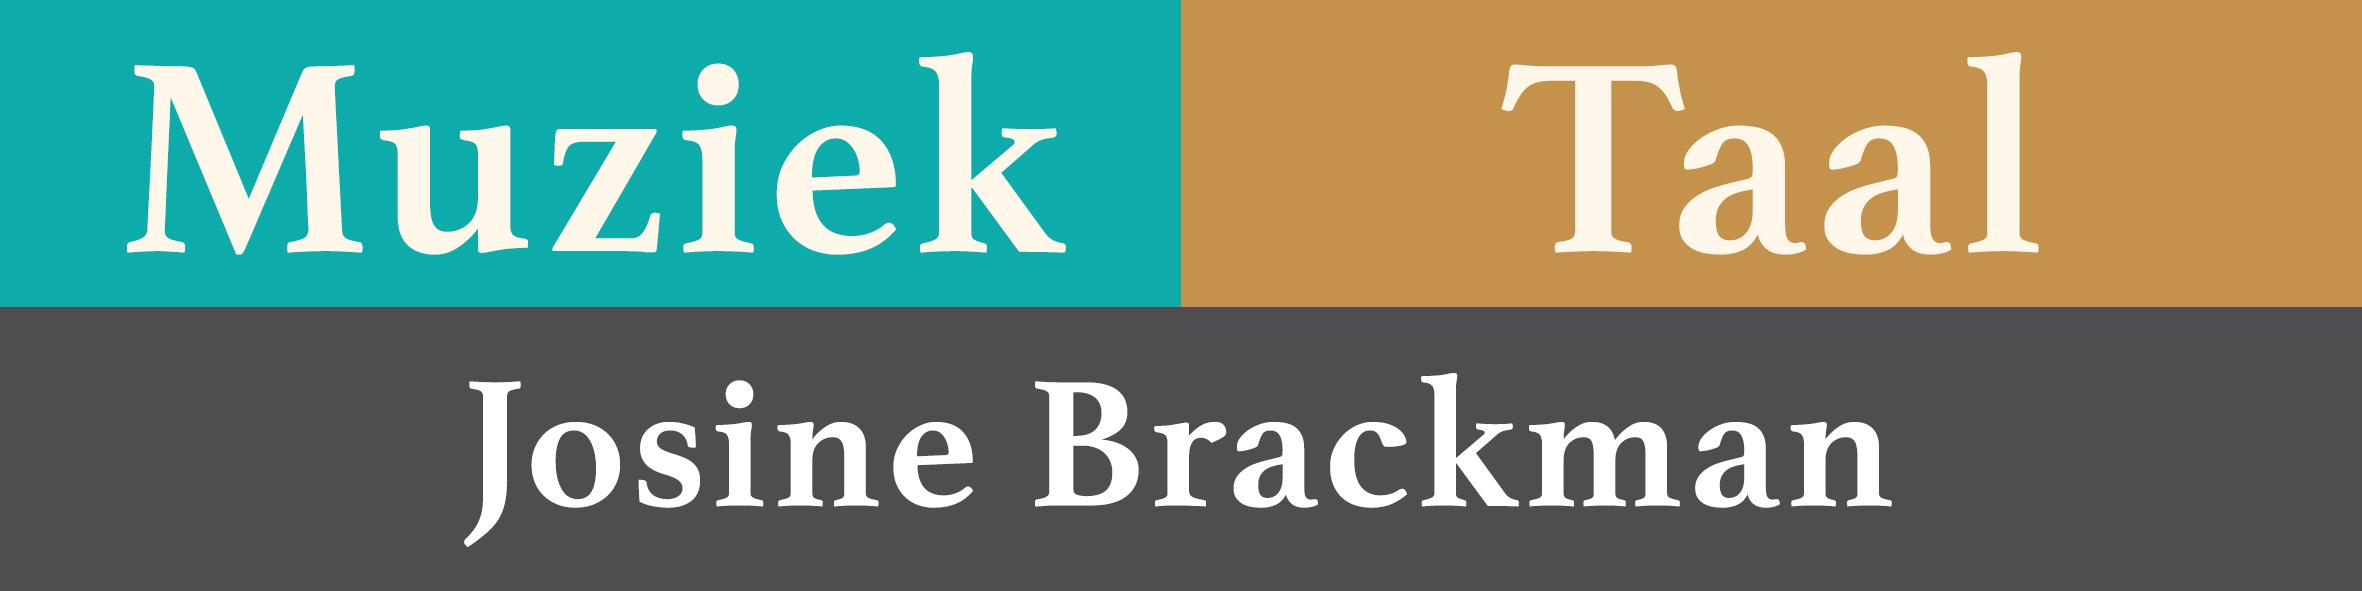 Josine Brackman -  Muziek | Taal